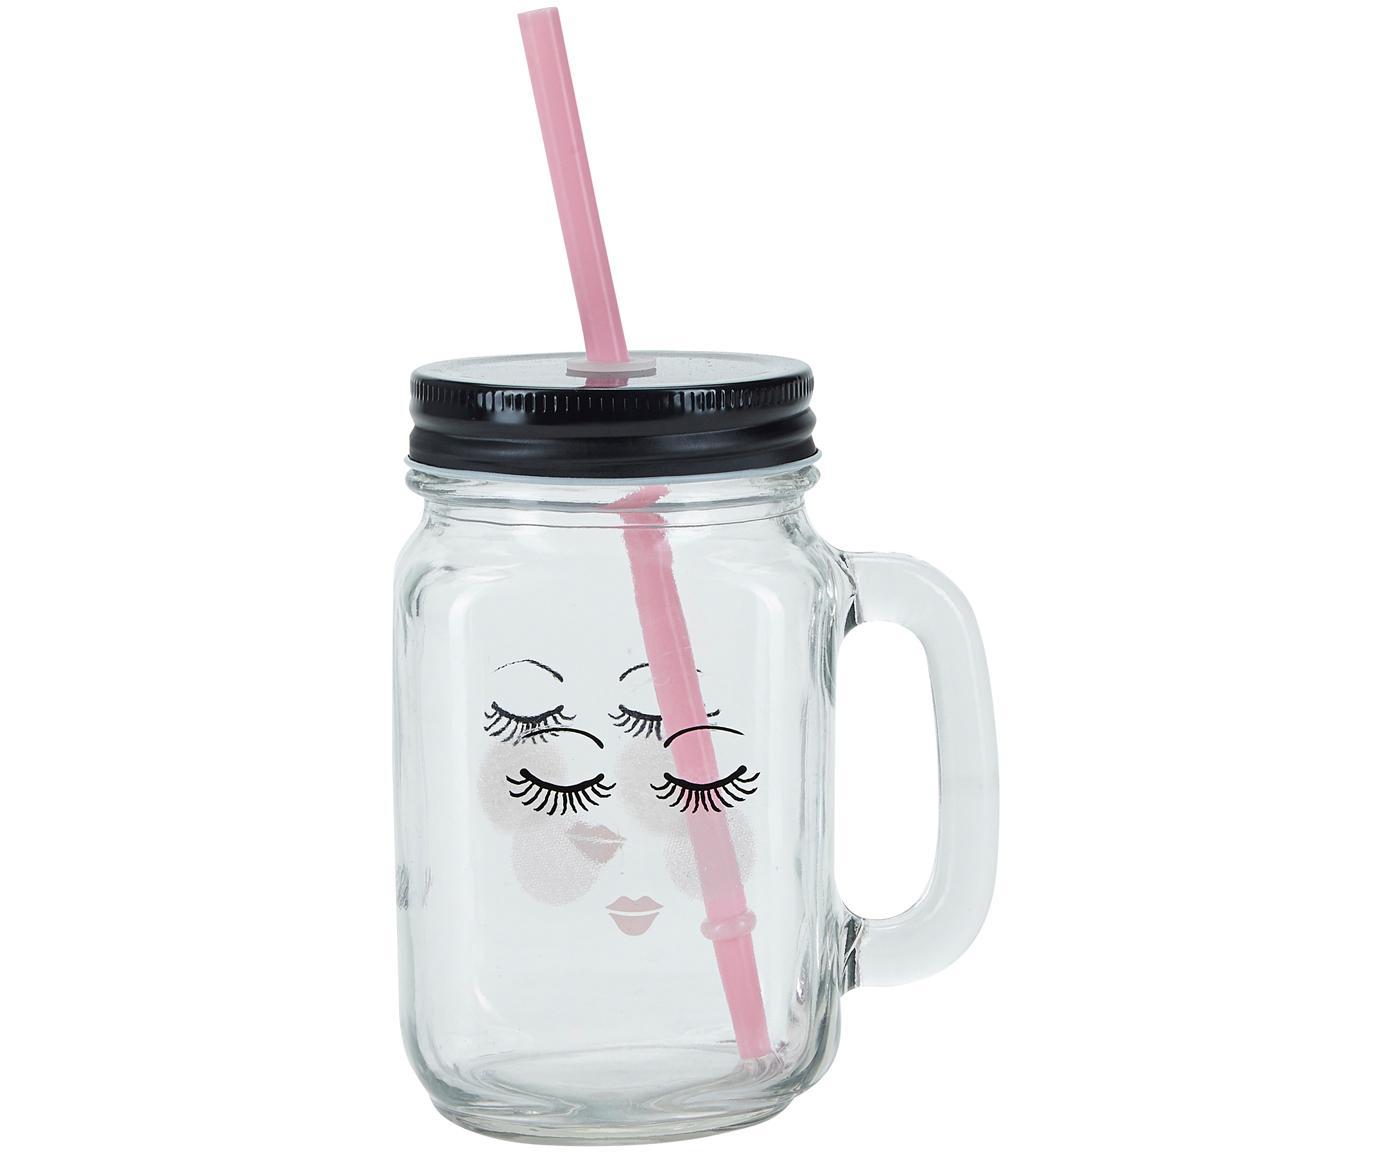 Trinkgläser Closed Eyes, 2 Stück, Behälter: Glas, Deckel: Metall, Kunststoff, Strohhalm: Kunststoff, Transparent, Schwarz, Rosa, Ø 7 x H 16 cm